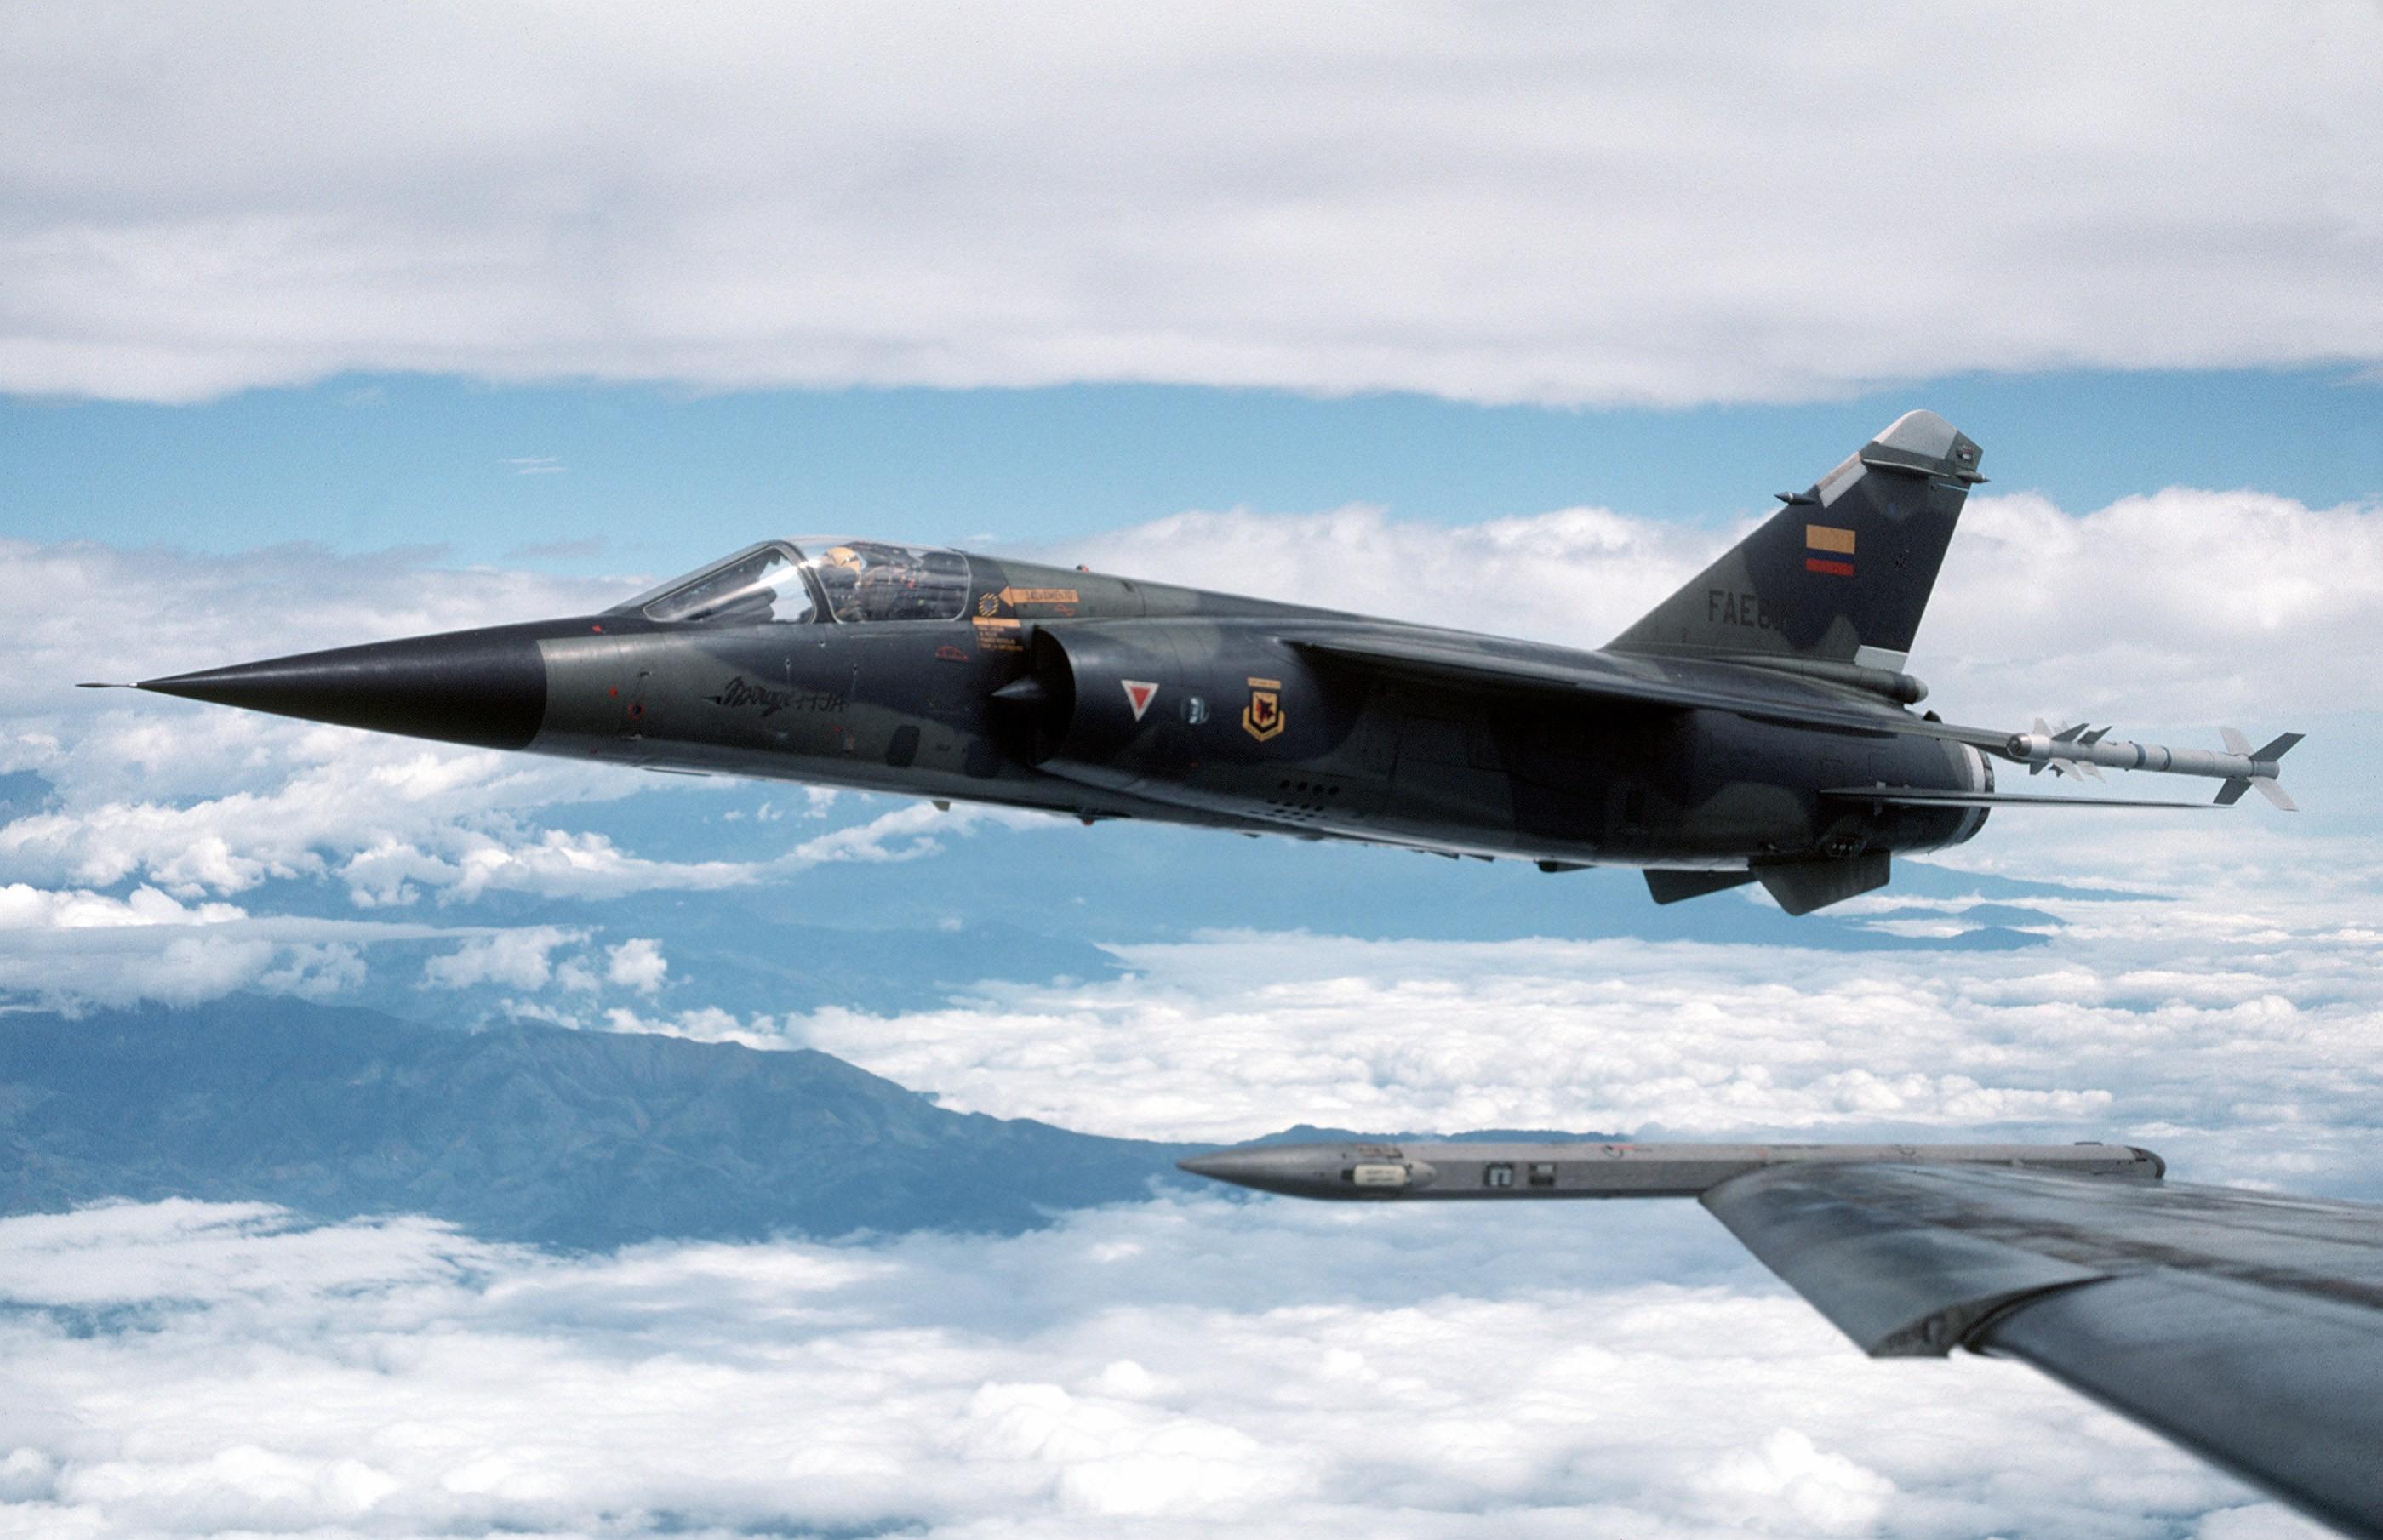 Aereo Da Caccia F15 : Sfondi veicolo aerei militari caccia mikoyan mig